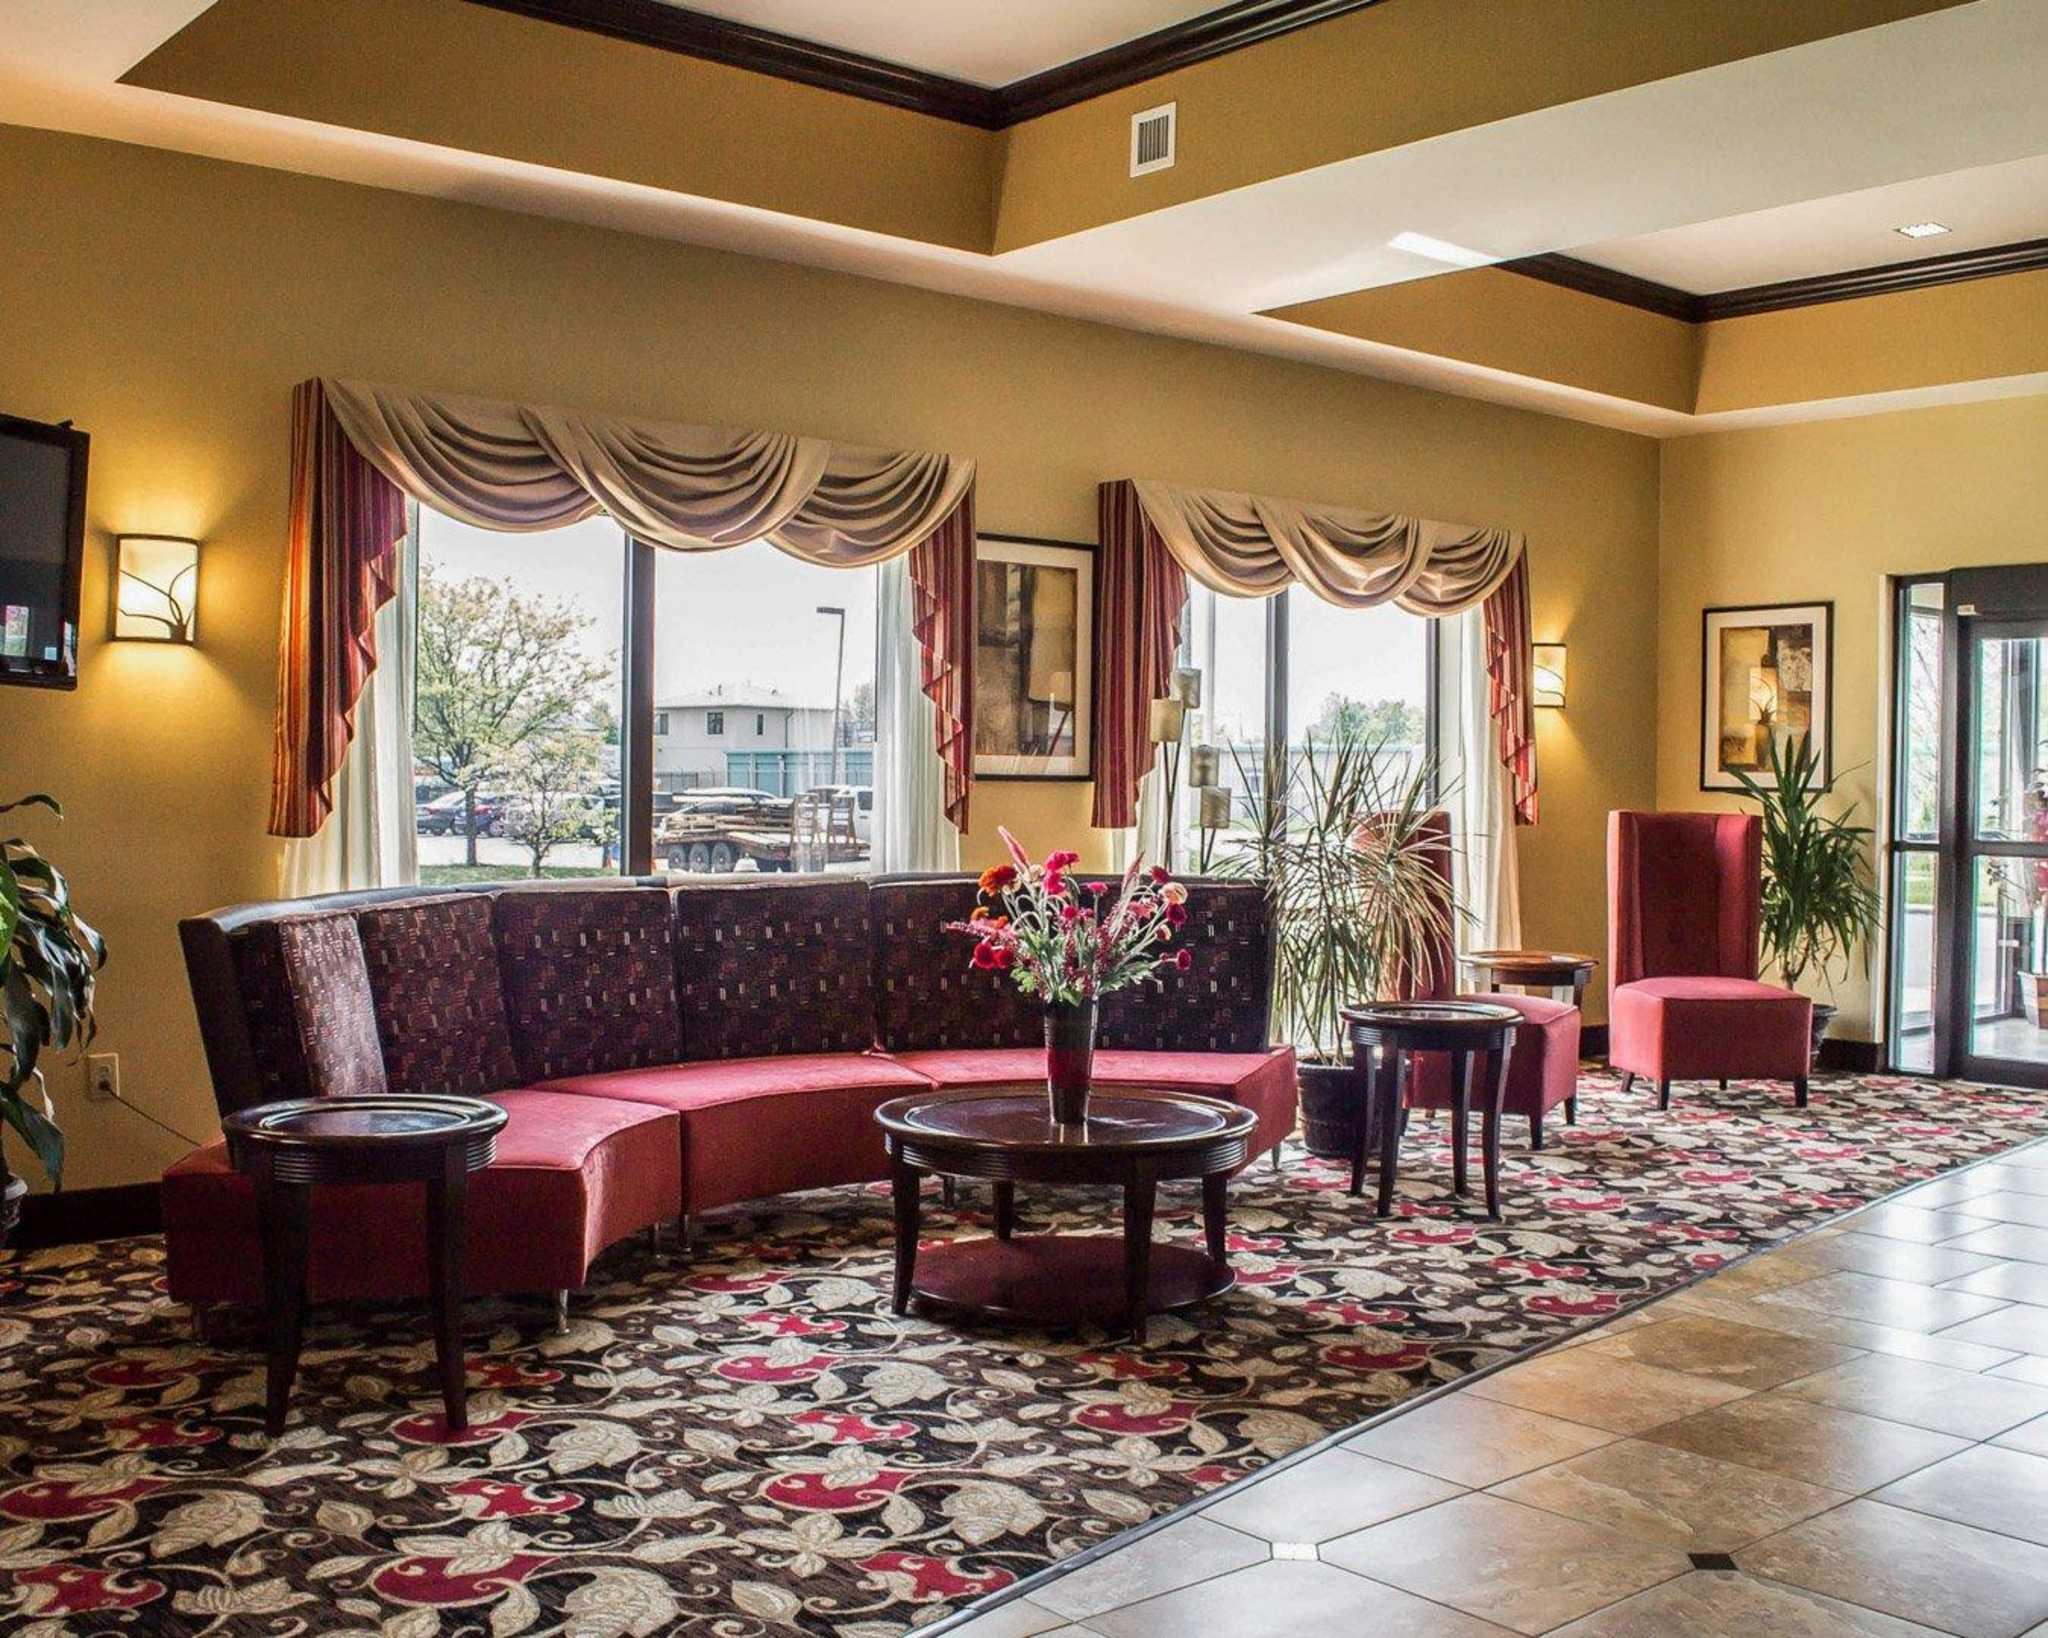 Comfort Suites East Broad at 270 image 40